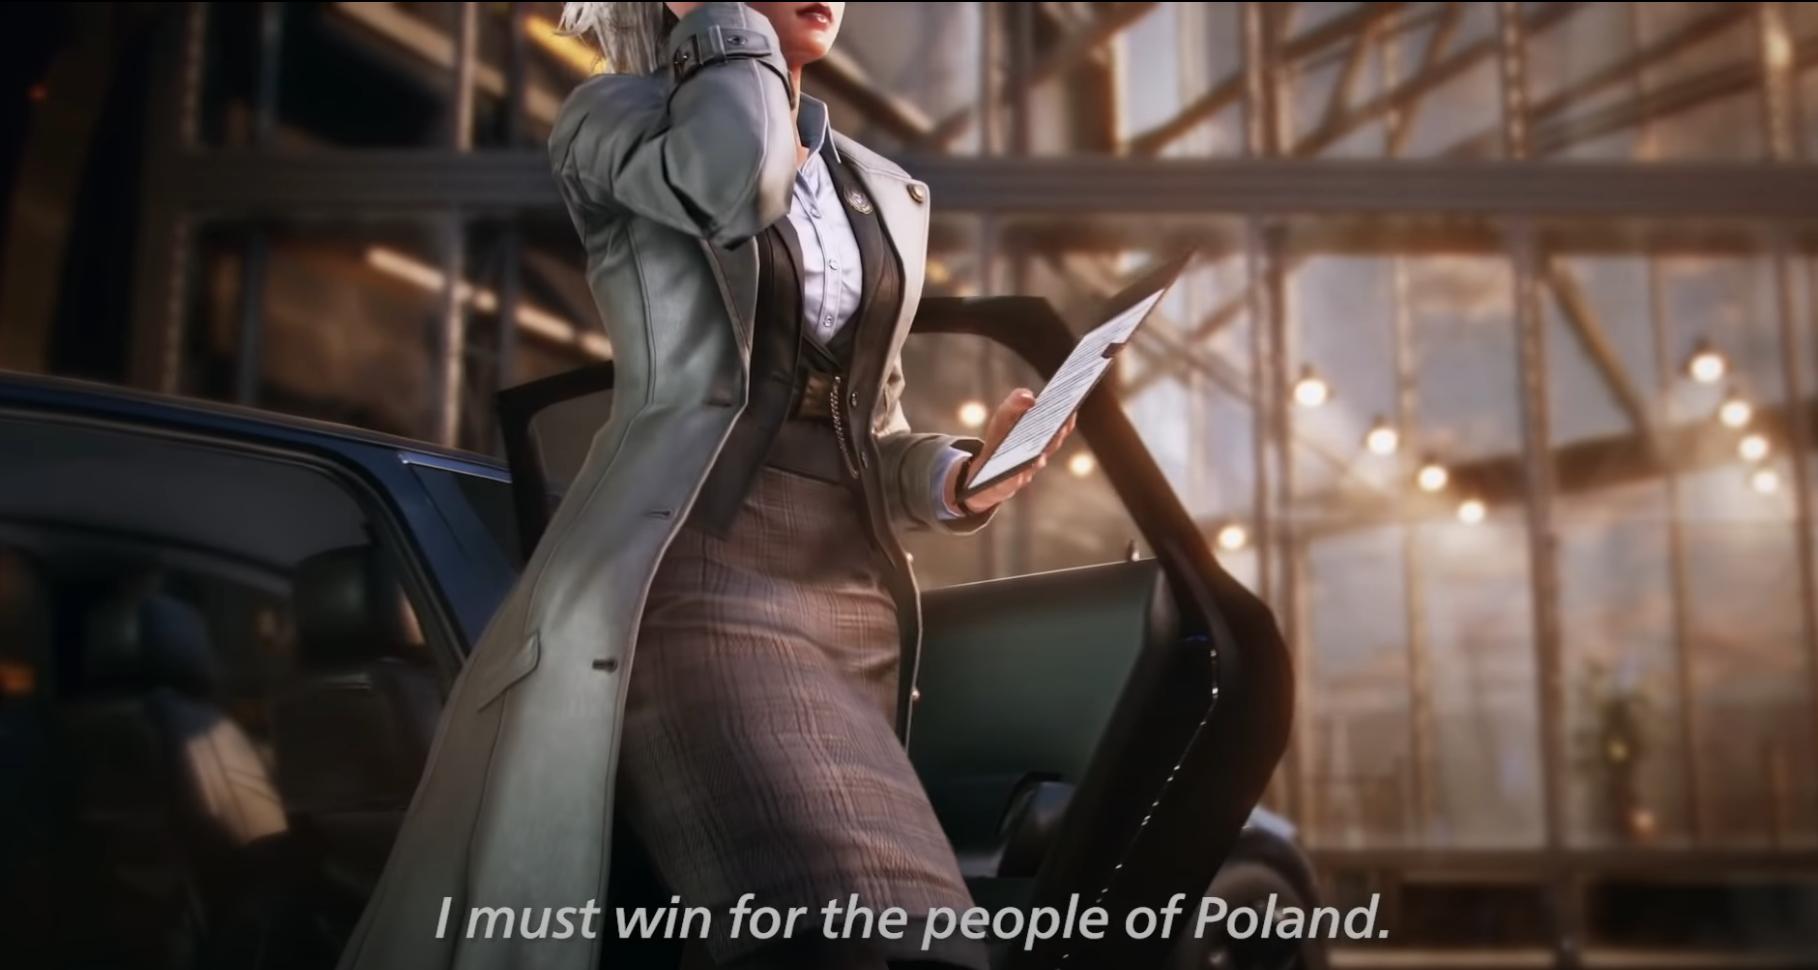 Bandai Namco is teasing a Polish Tekken 7 DLC character - VG247